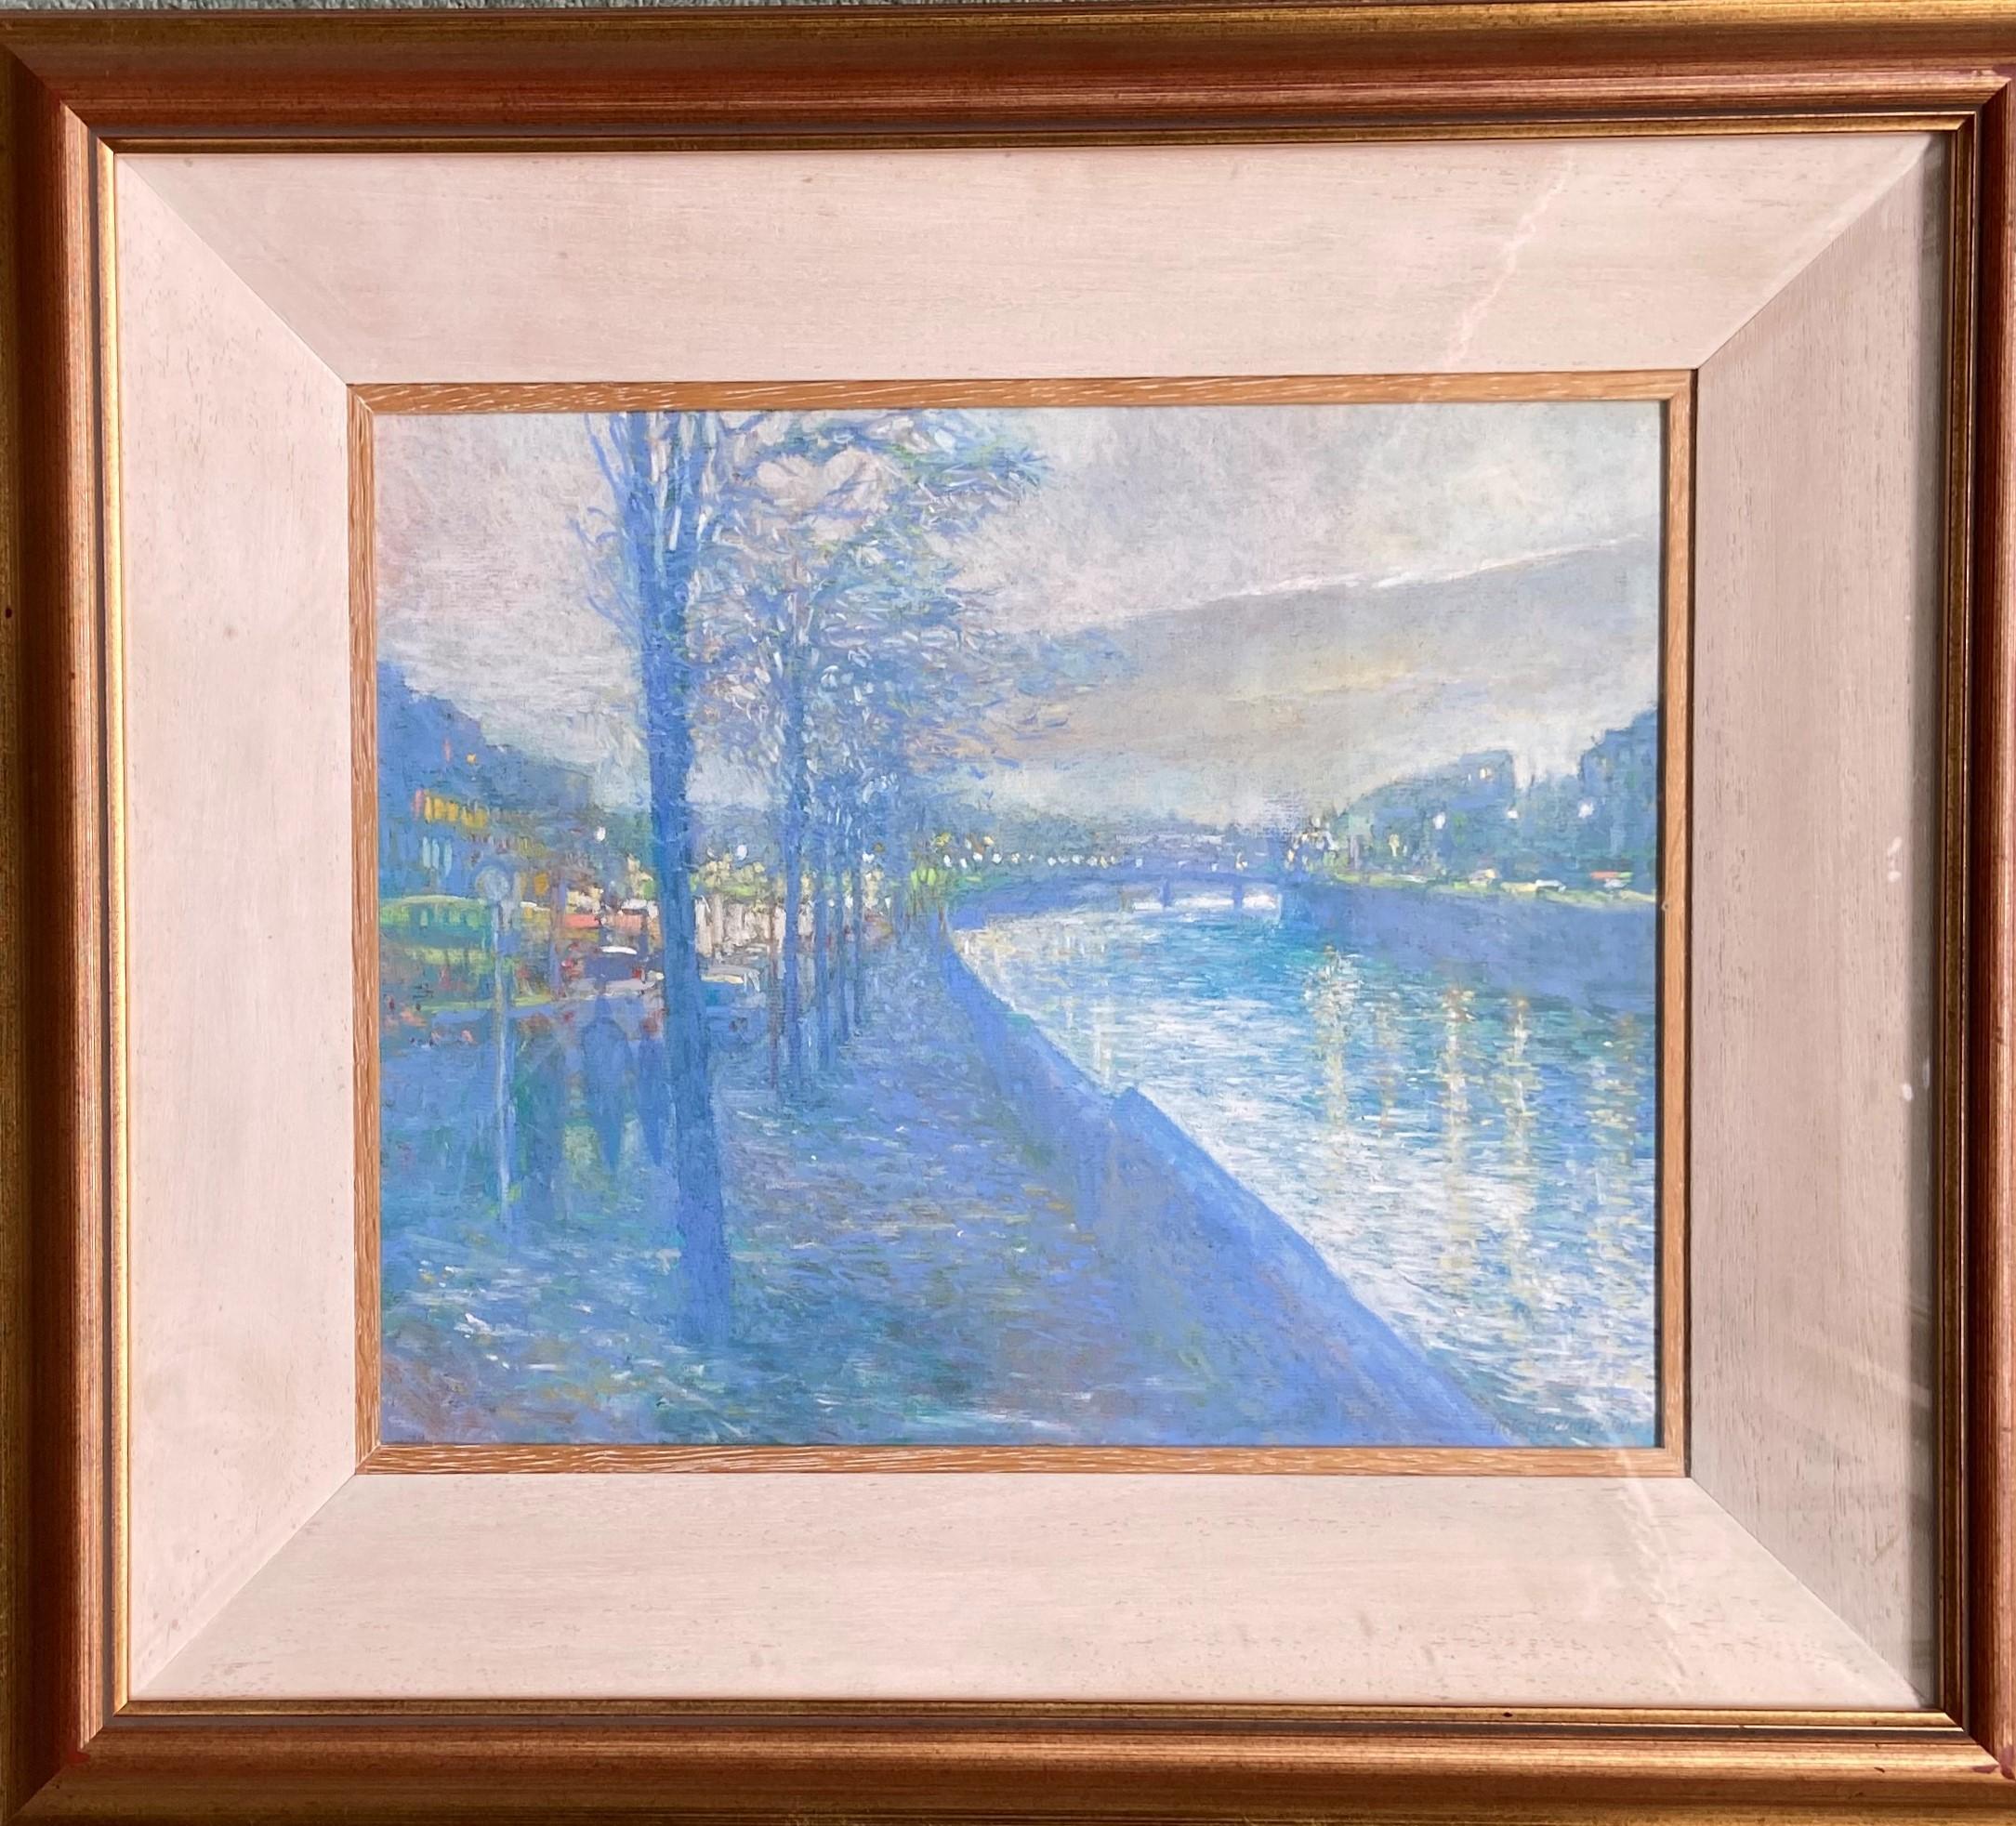 Victor Richardson (1952) ''Dusk on the Liffey'' and ''Dock Gates from Baggot St., Bridge,'' a